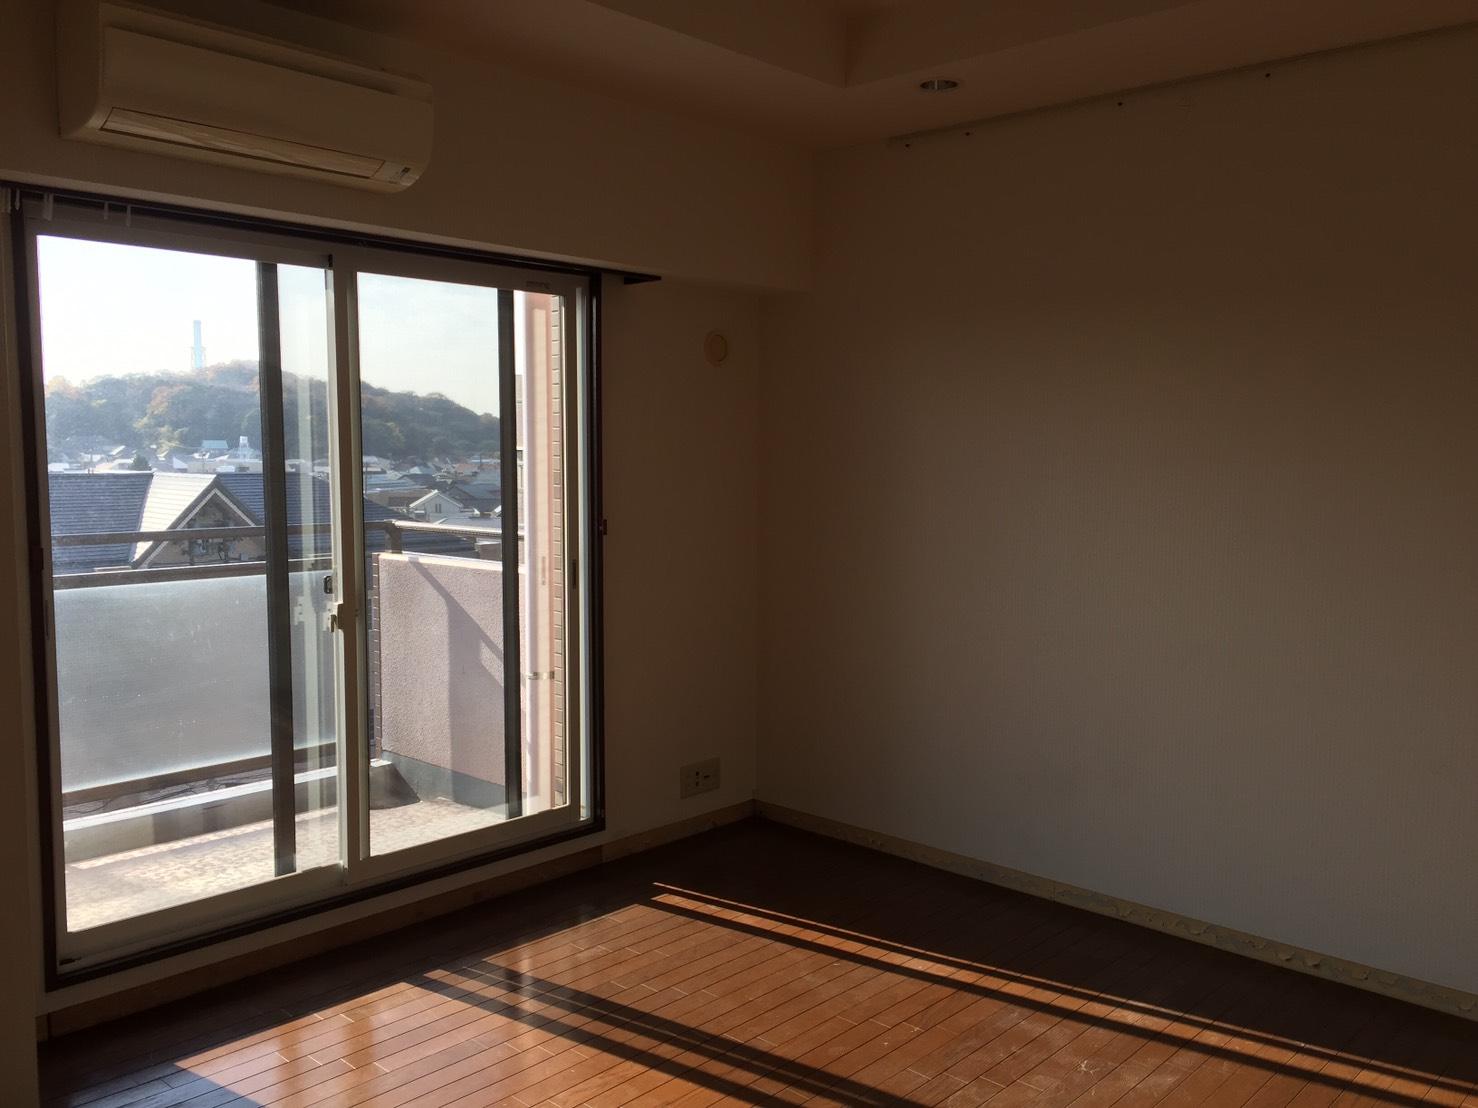 【 Before 02 】 リフォーム前のリビング 《 Asia Home 施工事例001 横浜市中区 3LDKマンション 》